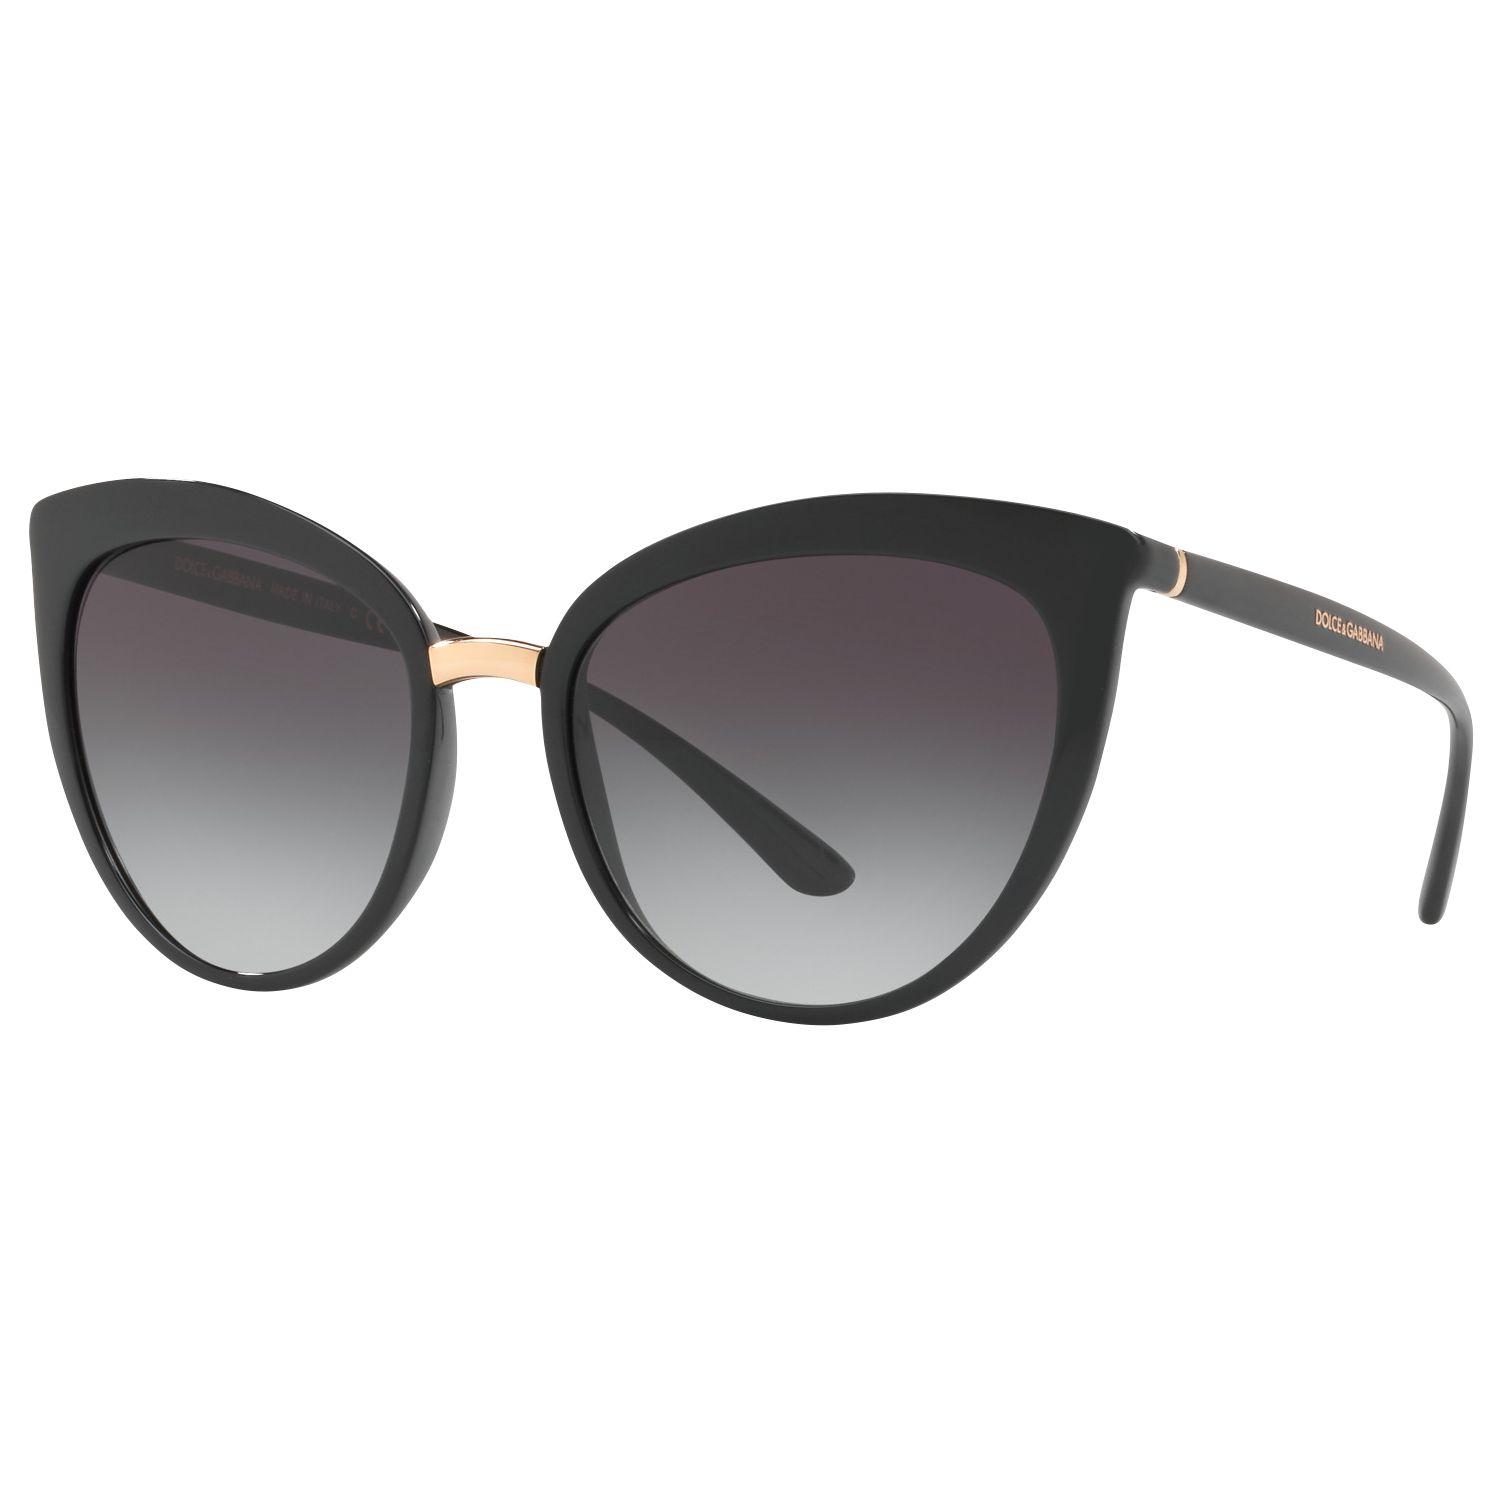 Dolce & Gabbana Dolce & Gabbana DG6113 Cat's Eye Sunglasses, Black/Grey Gradient